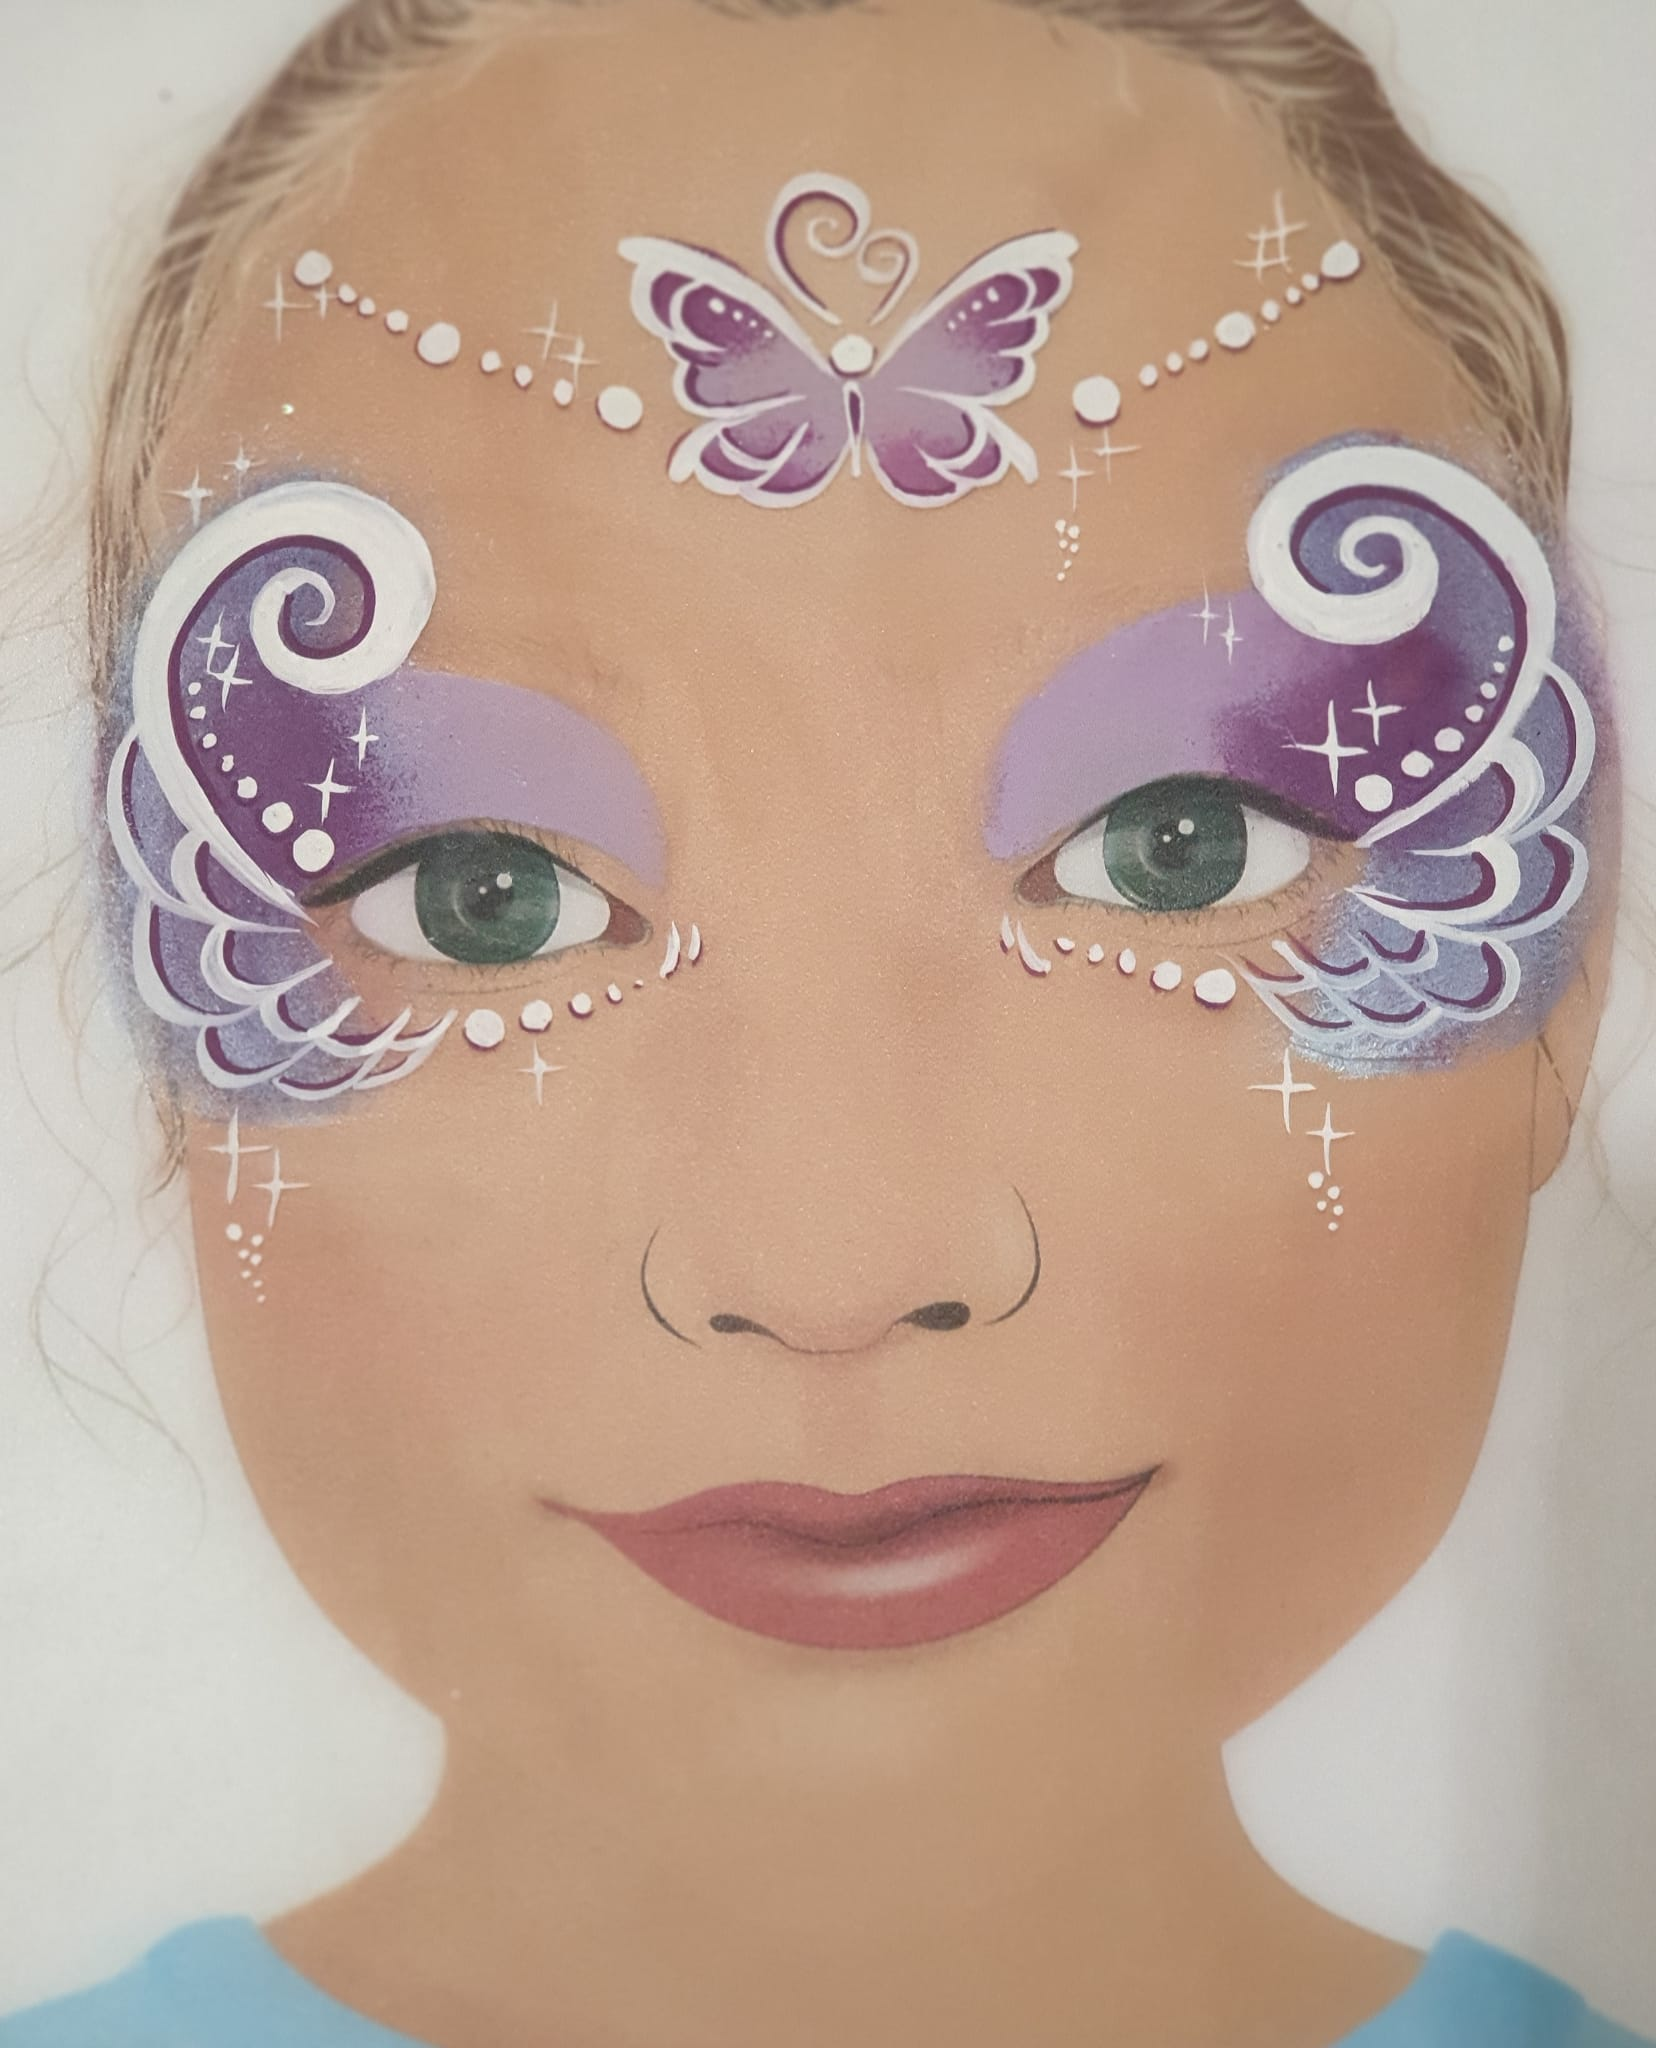 Maquillage fille professionnel papillon lilac